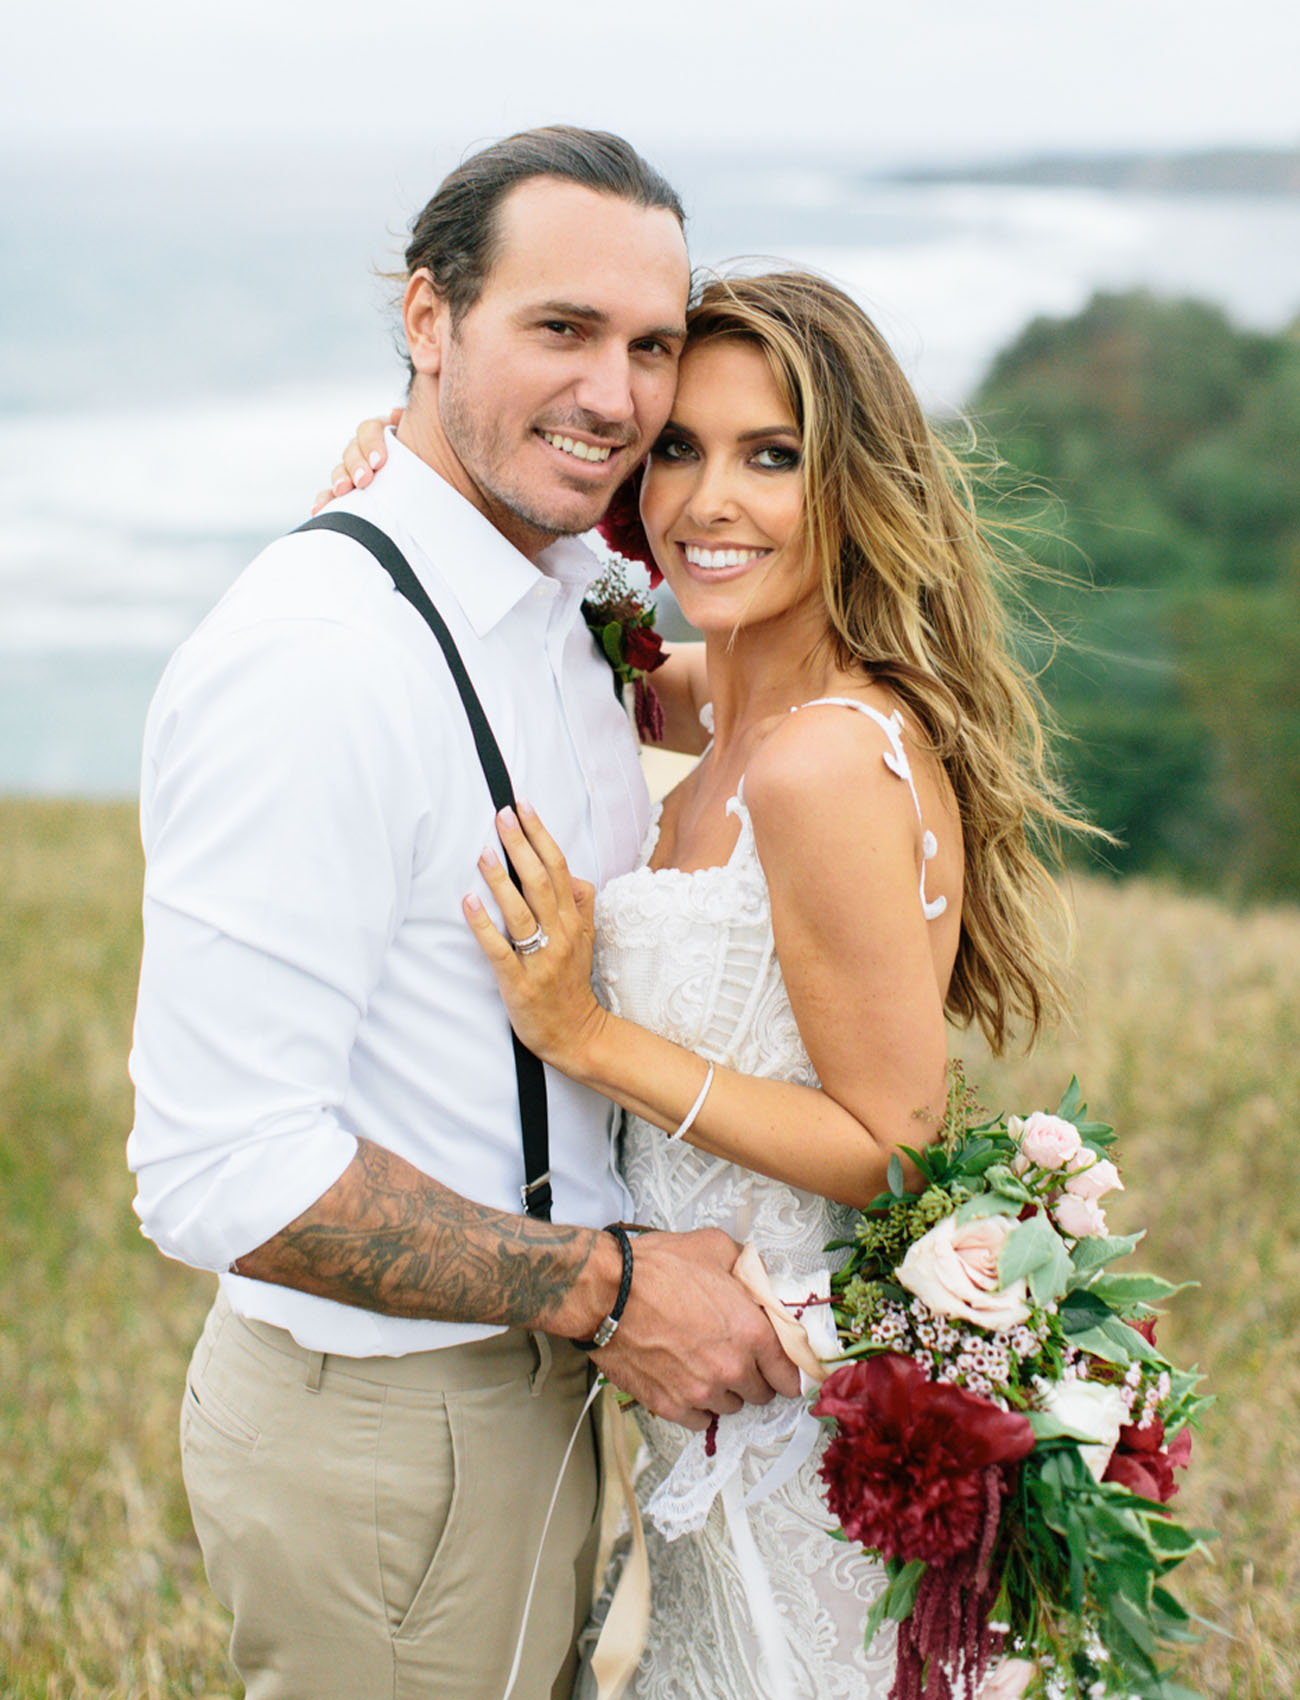 Audrina Patridge + Corey Bohan?s Boho Chic Kauai Wedding